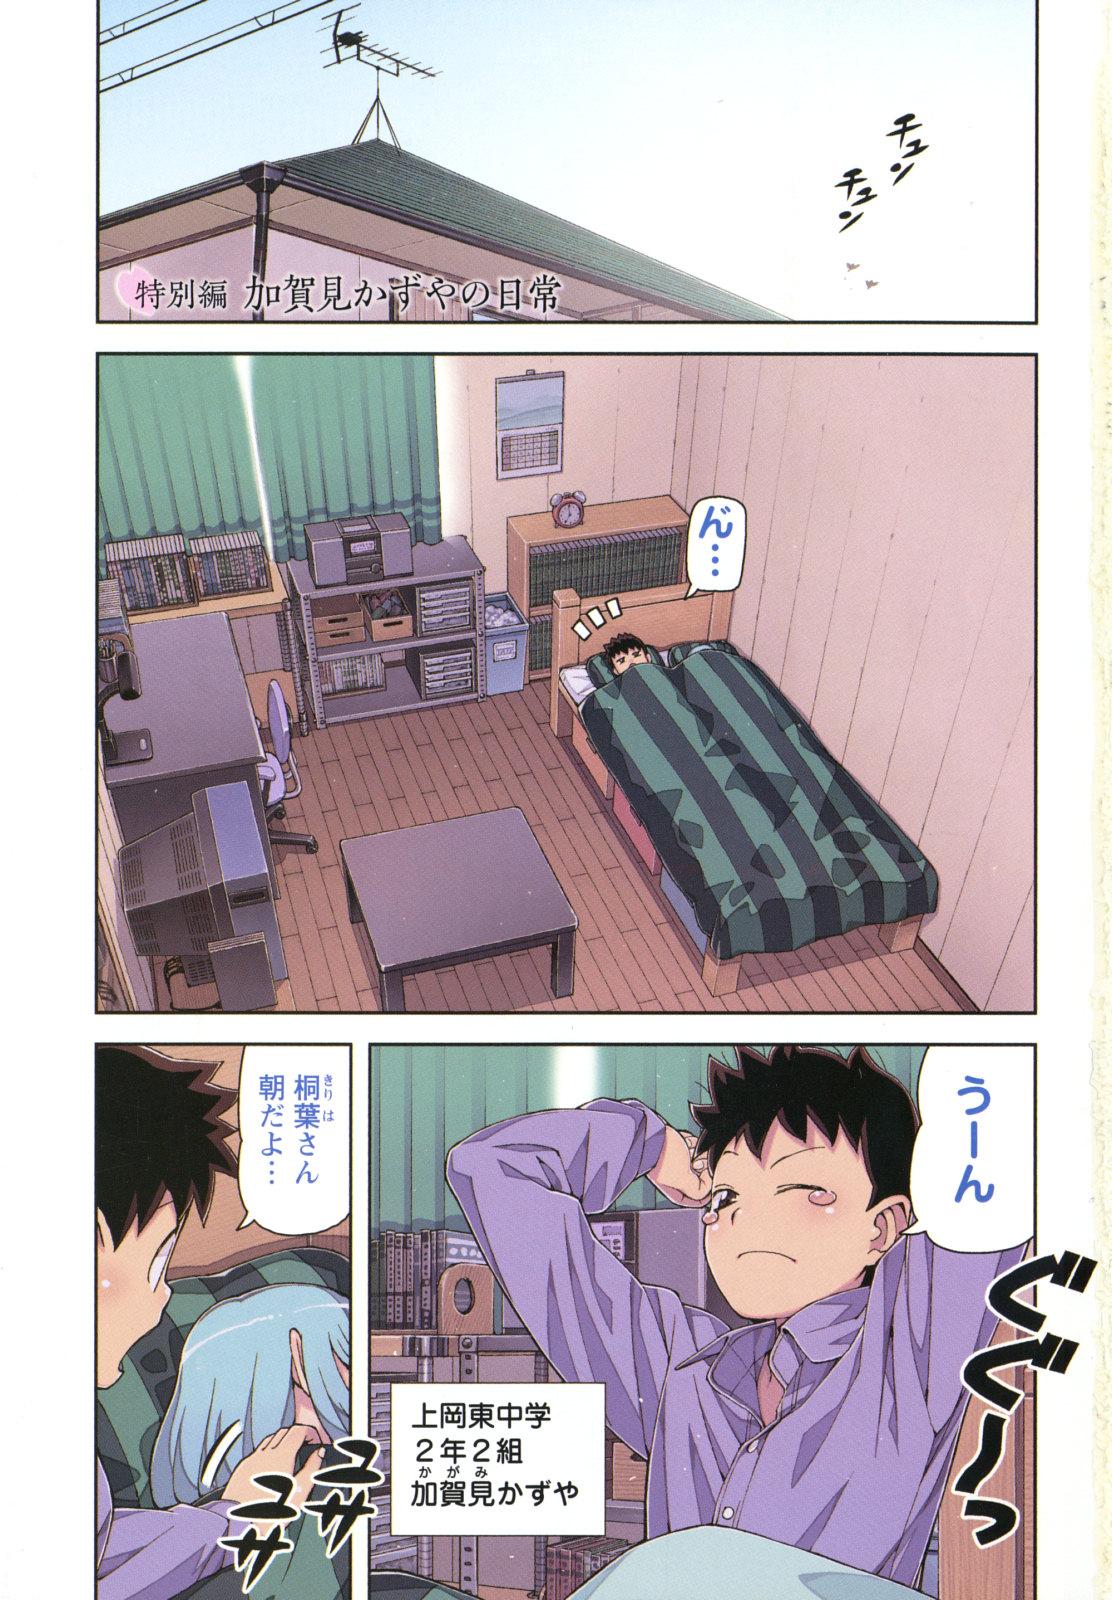 Kazuya Kagami's Daily Life